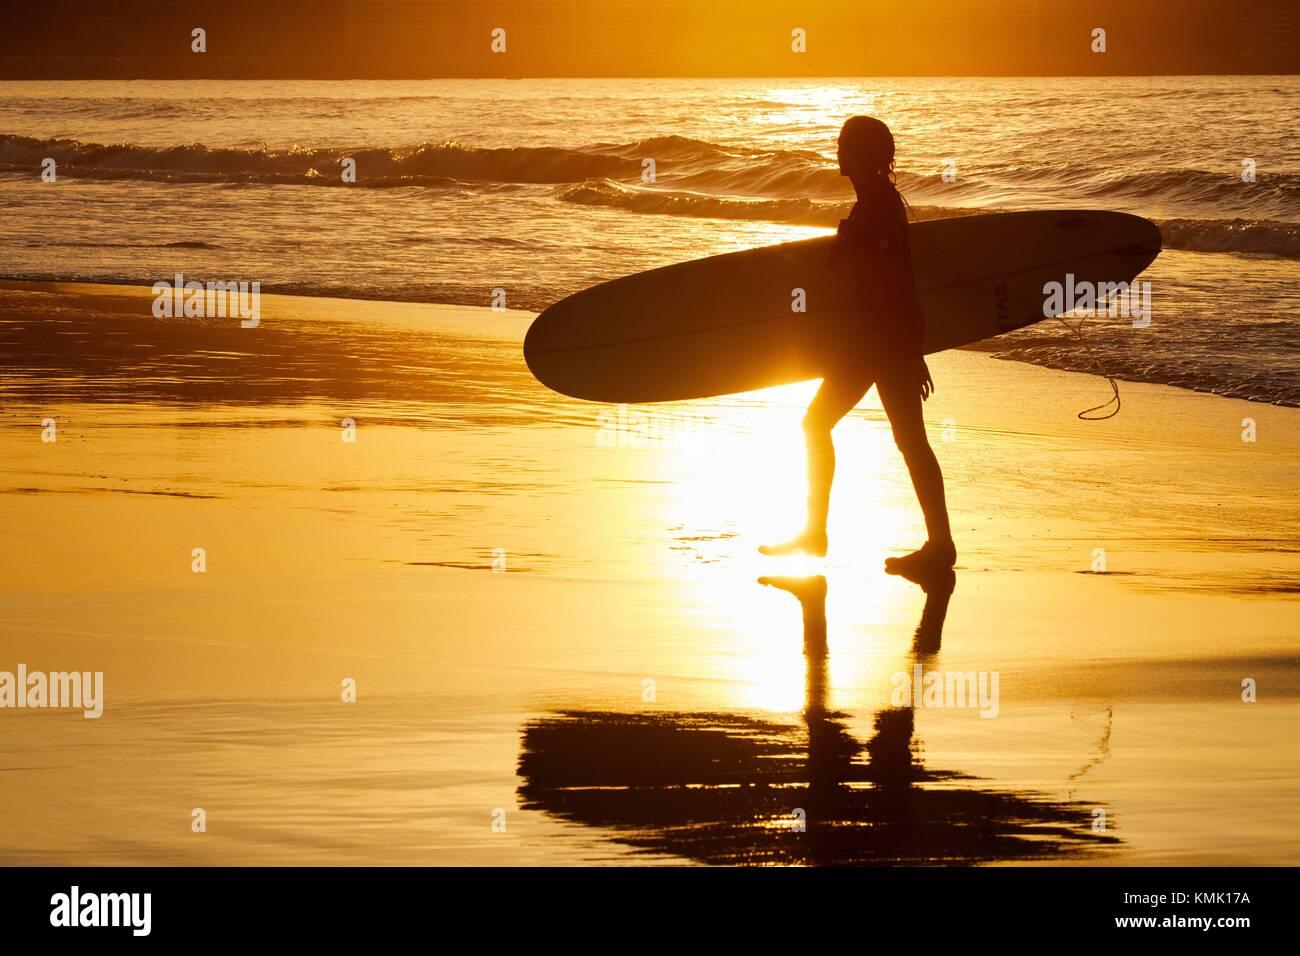 Surf, Beach, Hendaye, Aquitaine, Pyrenees Atlantiques, France - Stock Image